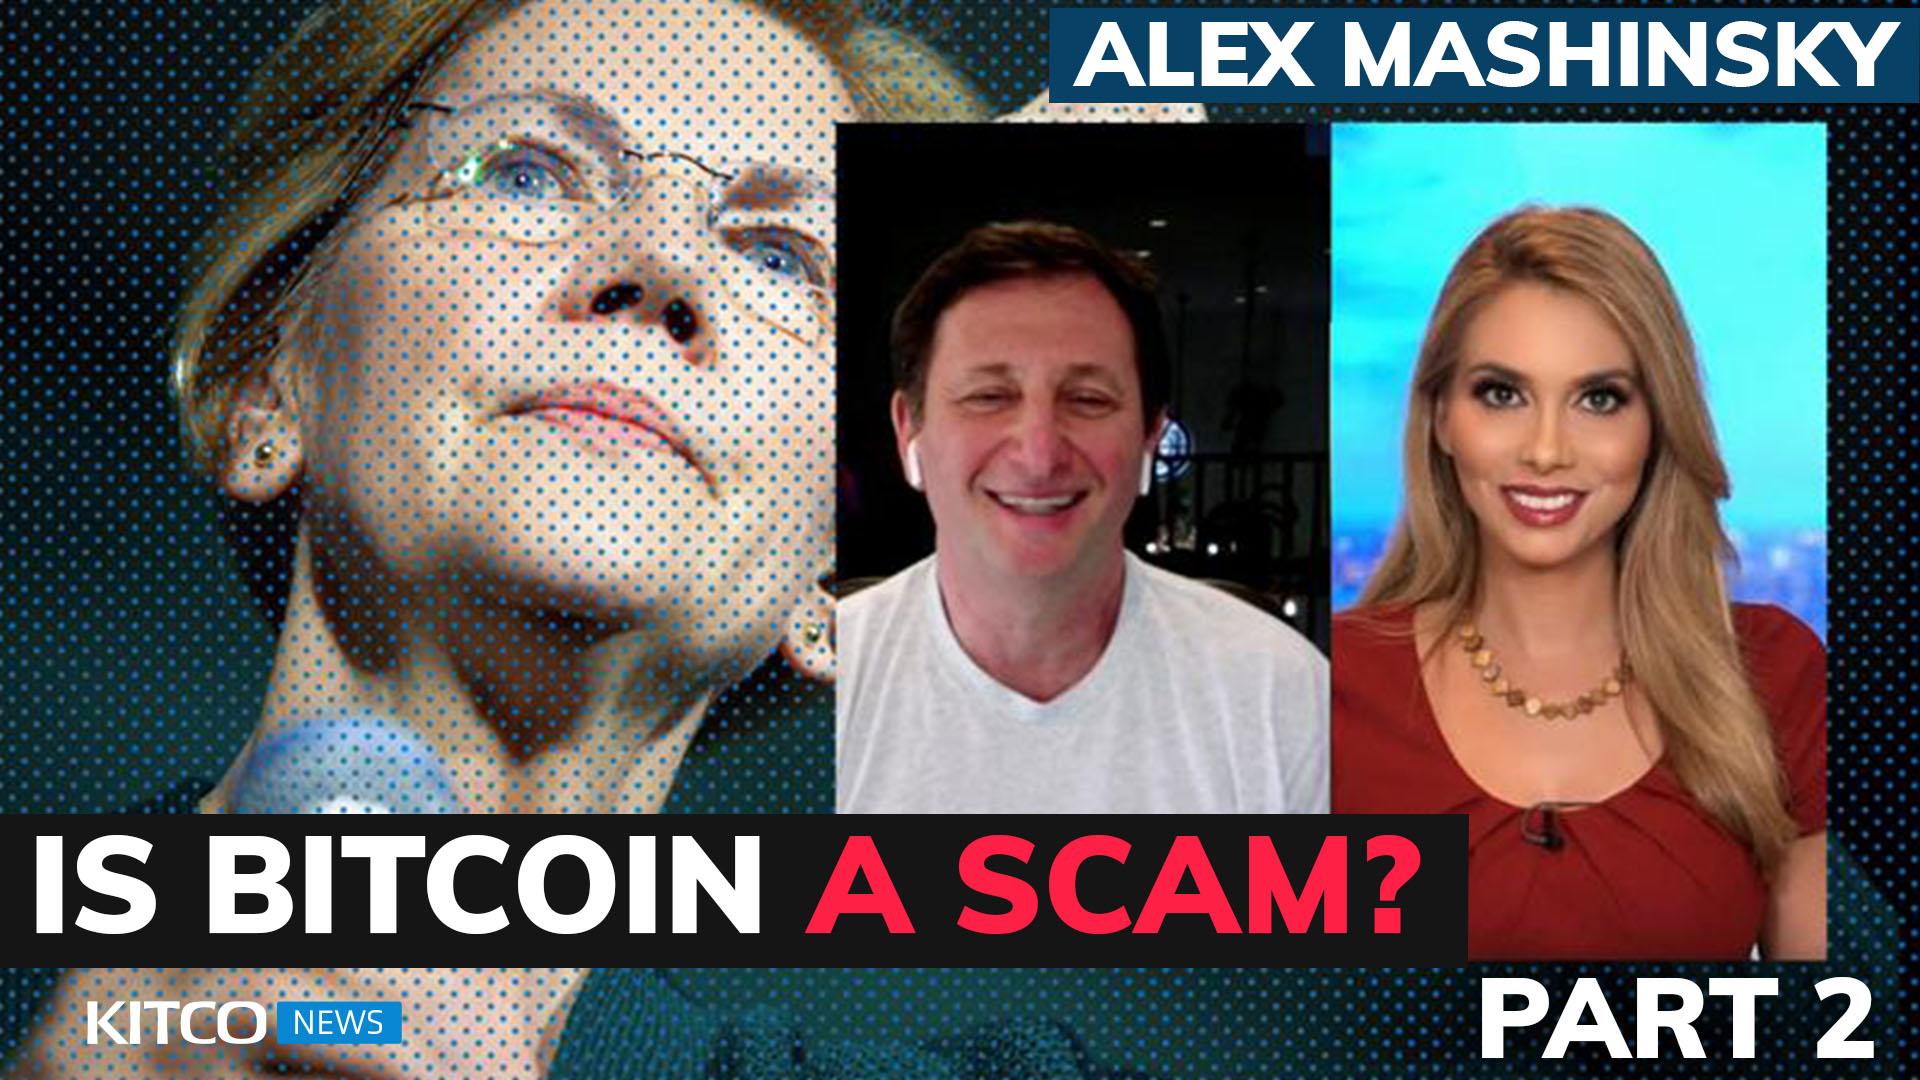 Senator Warren calls Bitcoin a 'scam', threatens more regulation; Alex Mashinsky says she's wrong